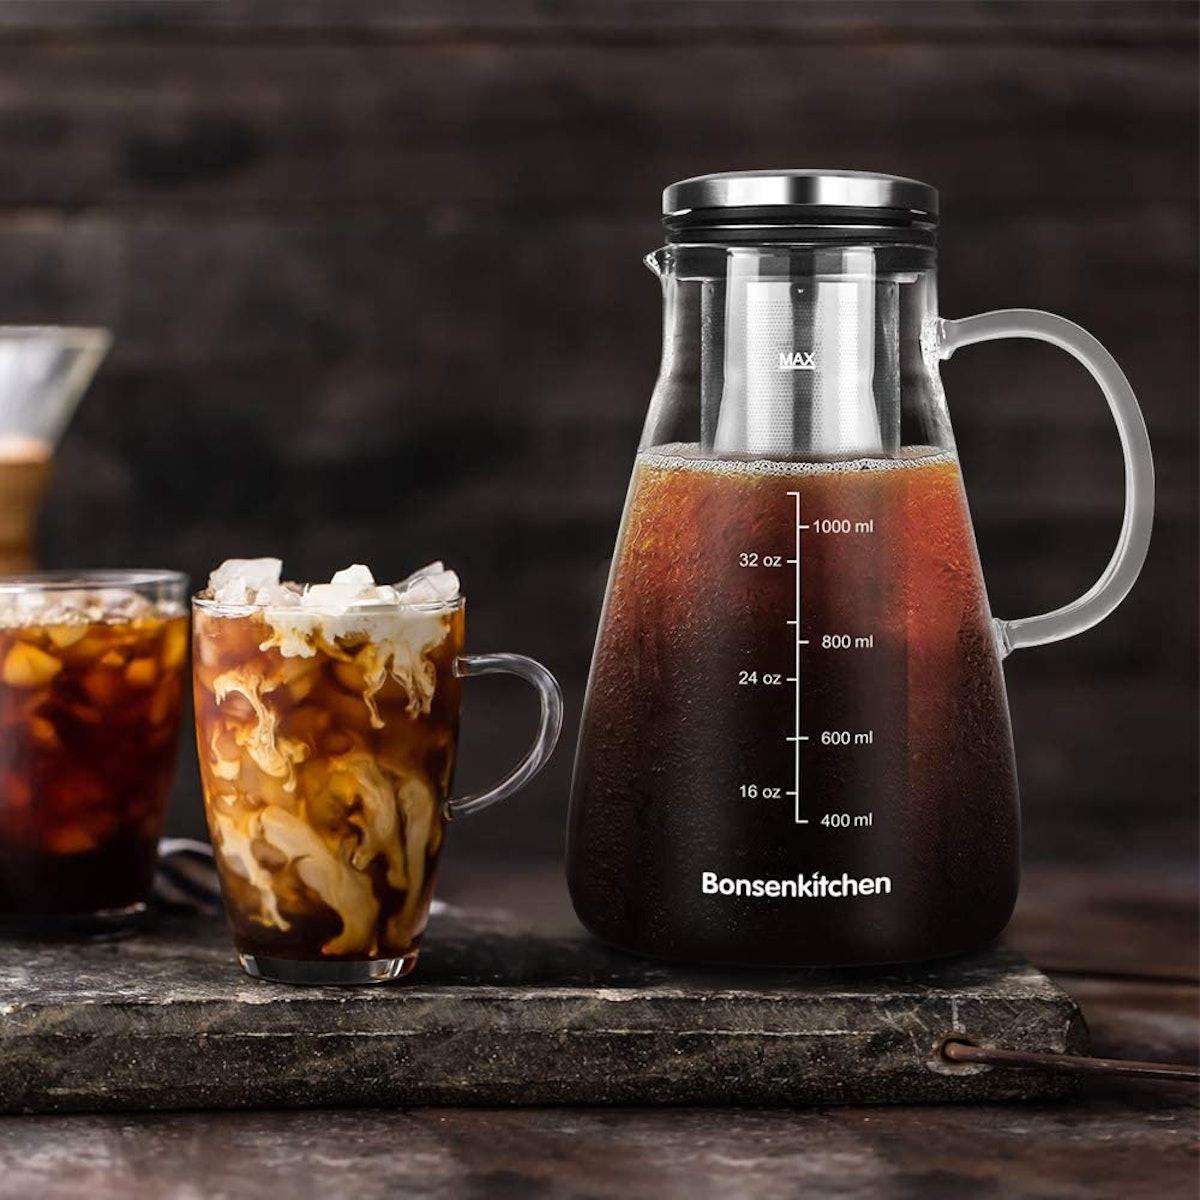 Bonsenkitchen Cold-Brew Coffee Maker